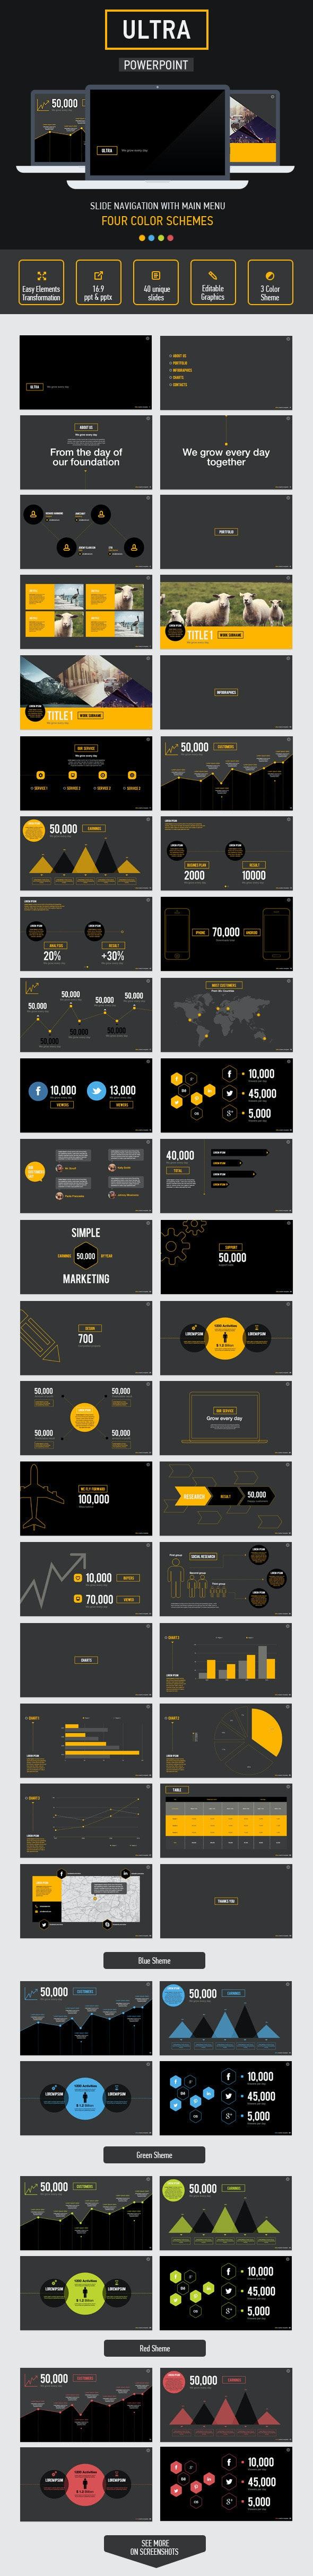 Ultra PowerPoint Presentation Template - Creative PowerPoint Templates